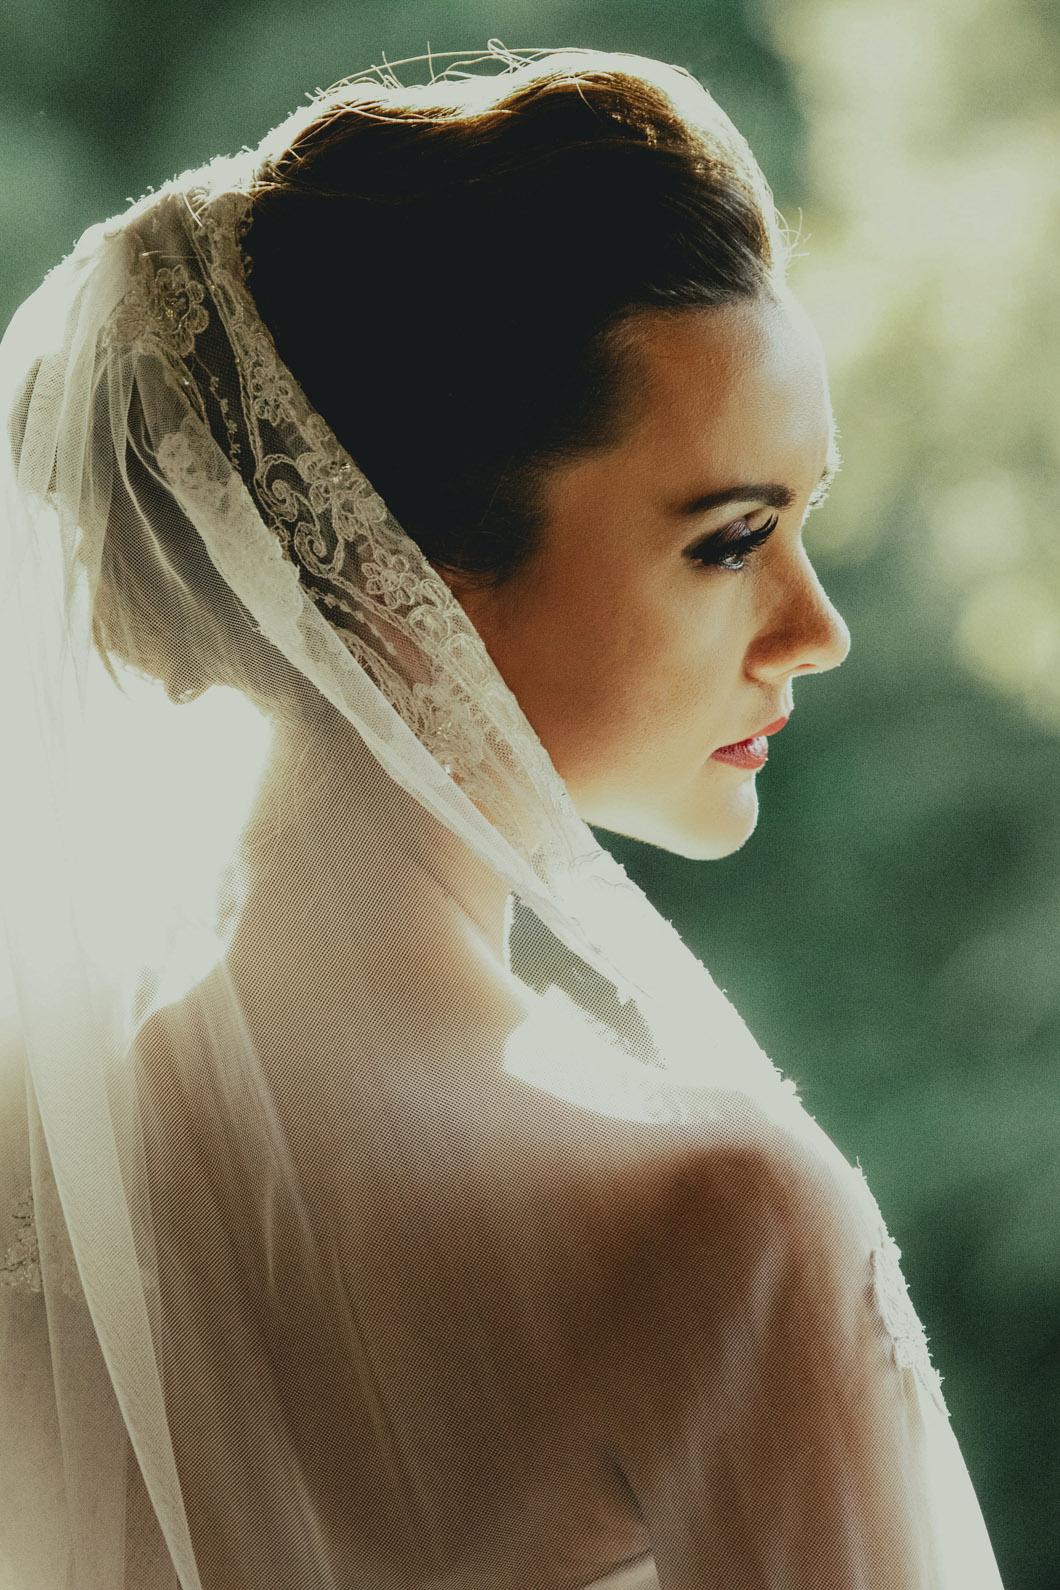 Djurönäset bröllop foto